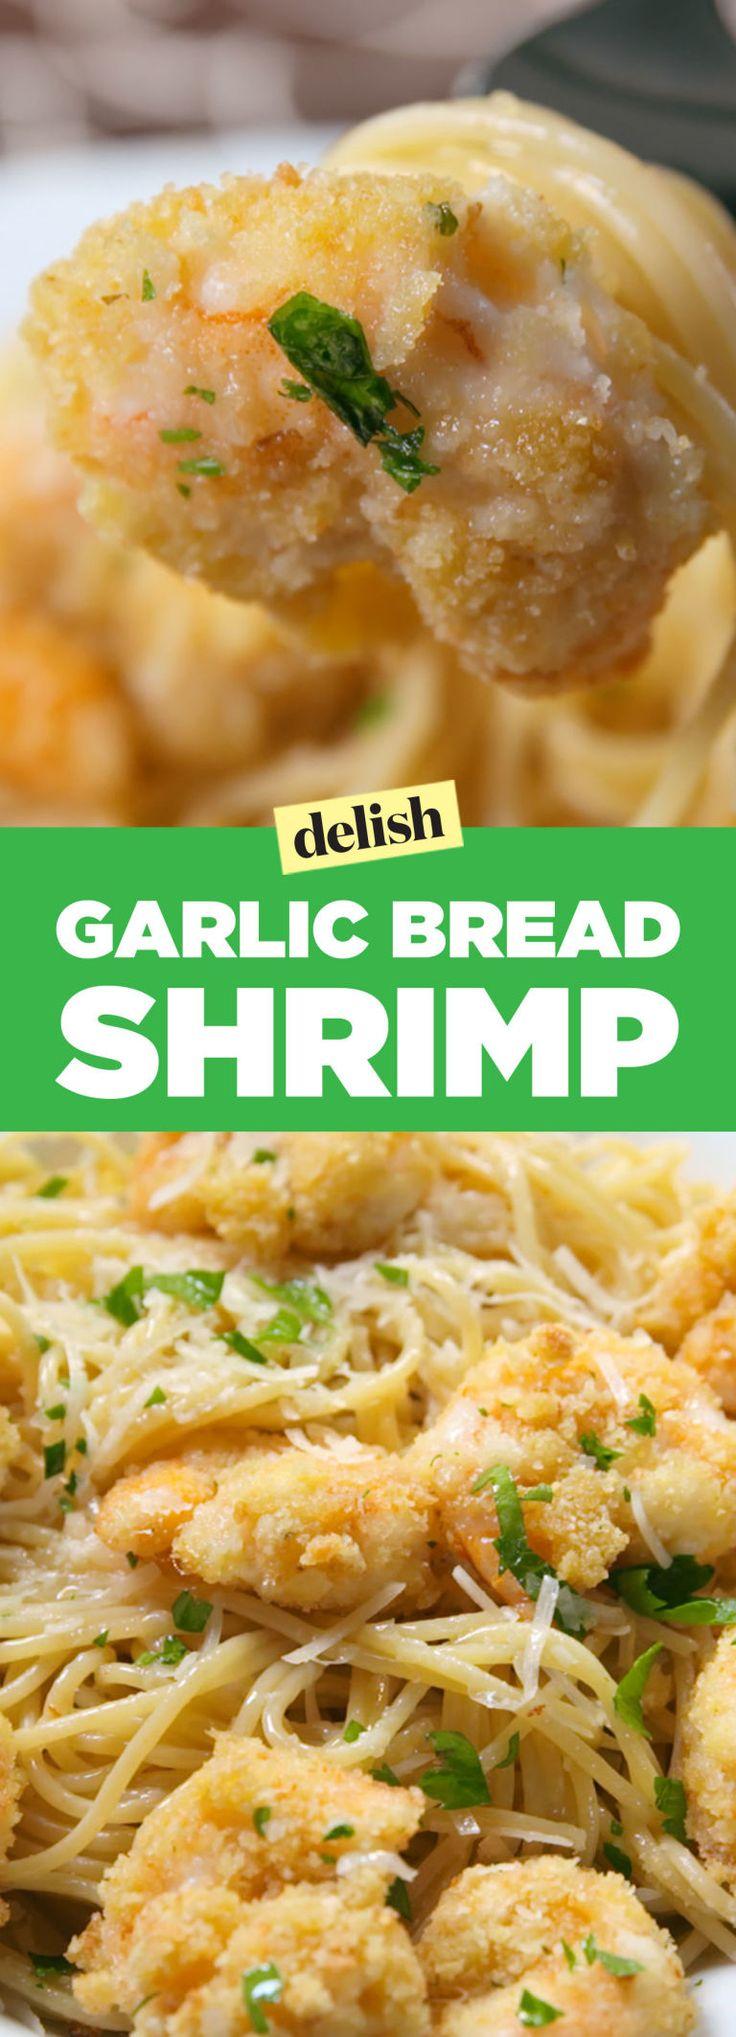 Easy recipes using frozen shrimp